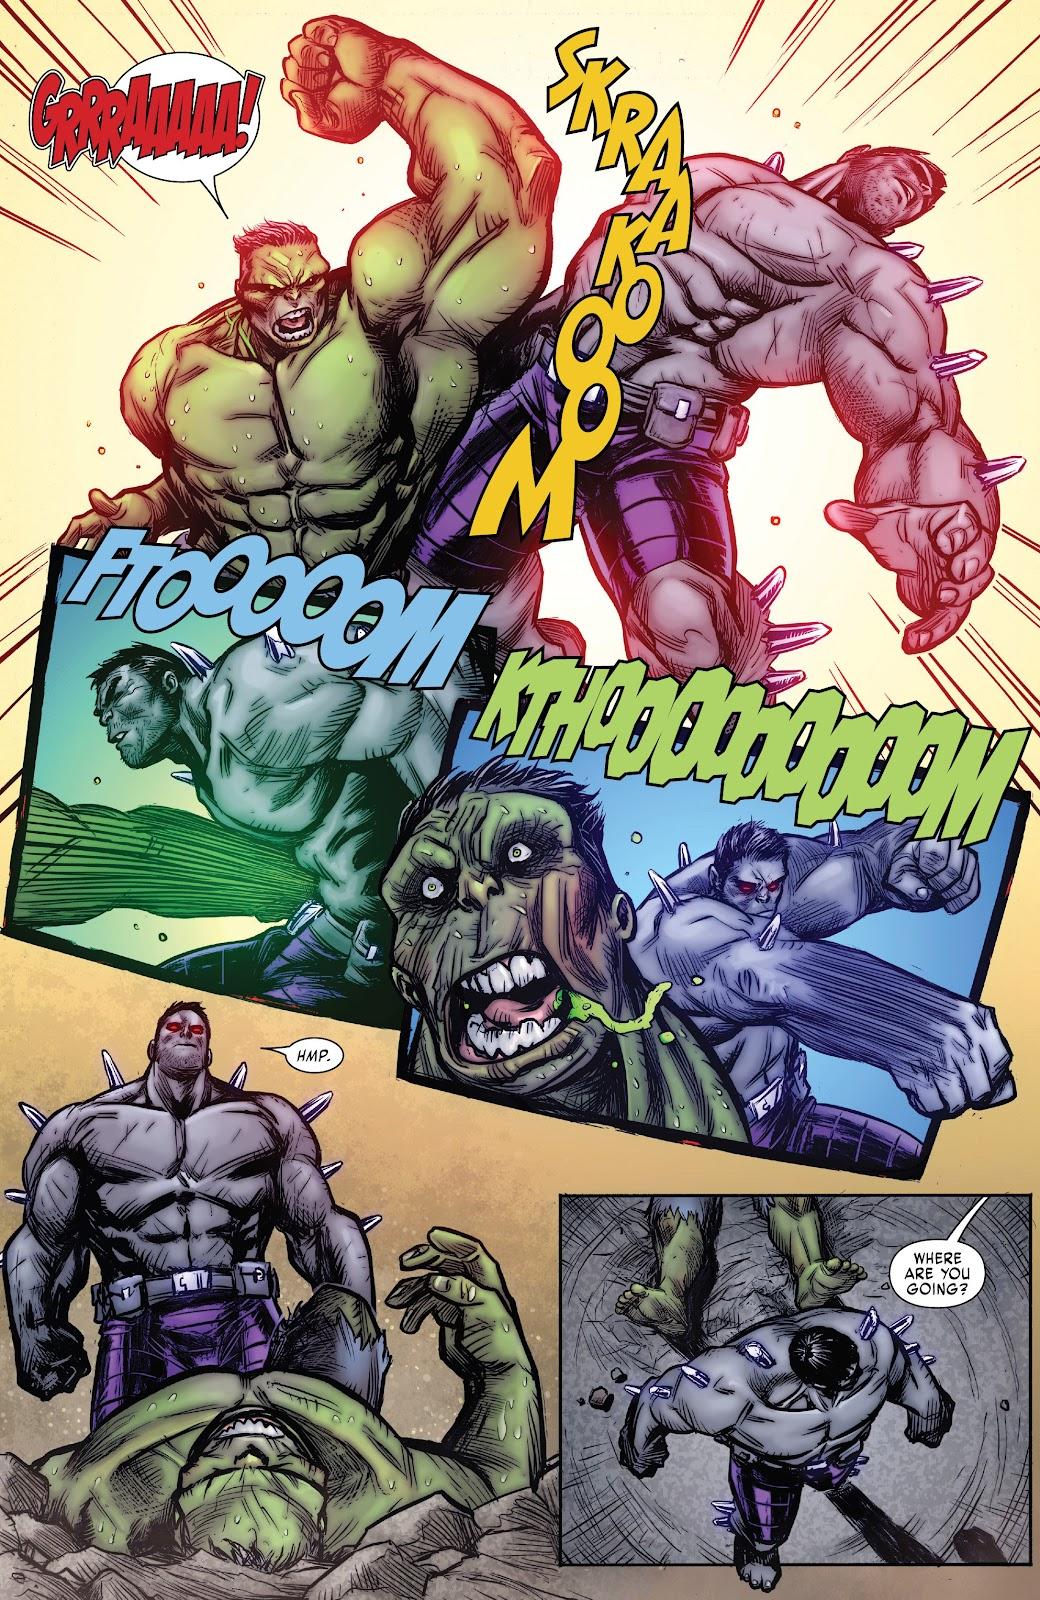 Read online Hulkverines comic -  Issue #1 - 25